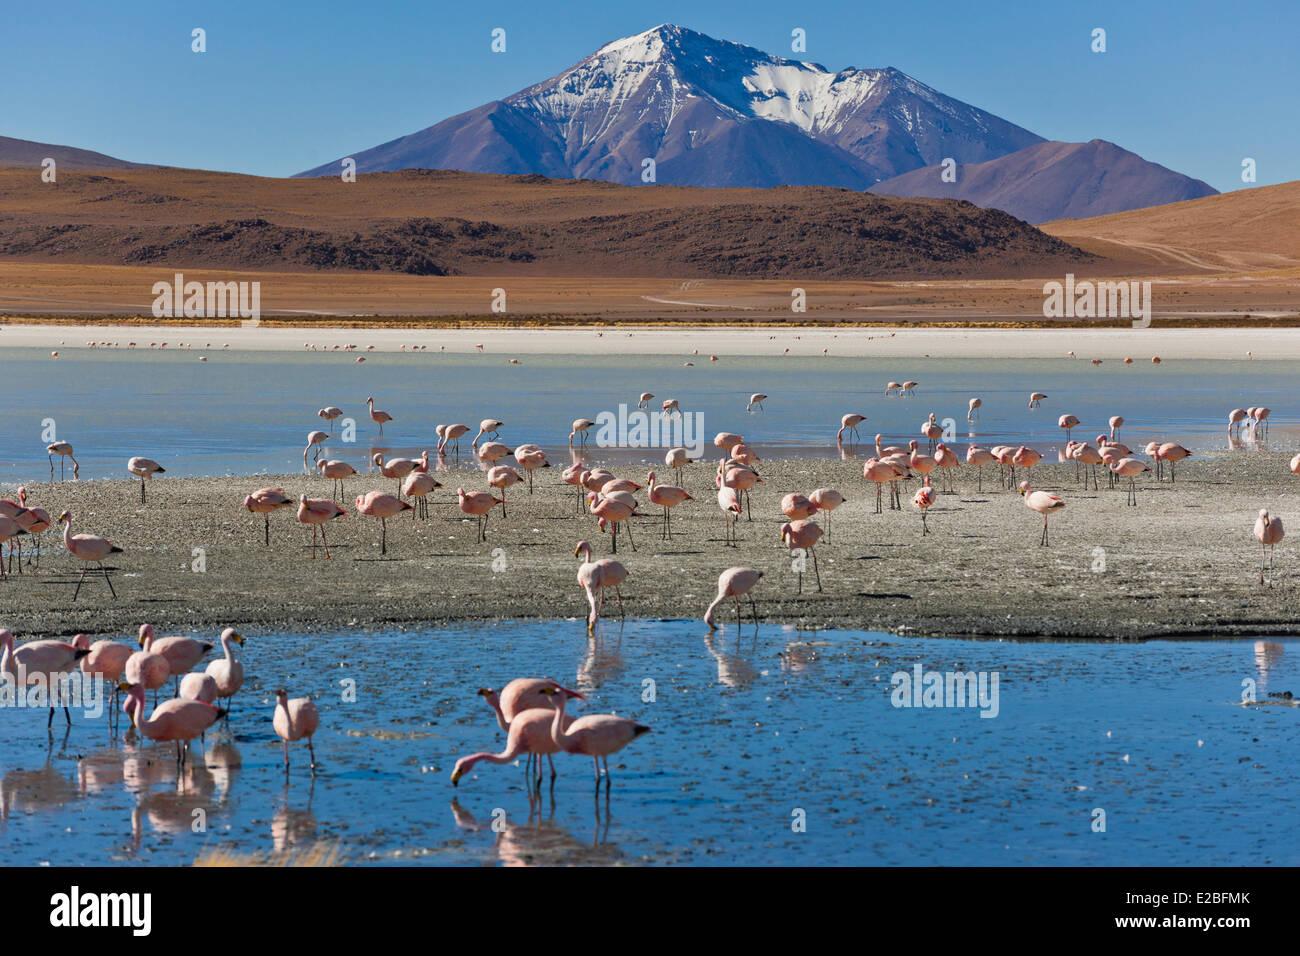 Bolivia, Potosi Department, Sur Lipez Province, Eduardo Avaroa Andean Fauna National Reserve, Laguna Hedionda whose - Stock Image